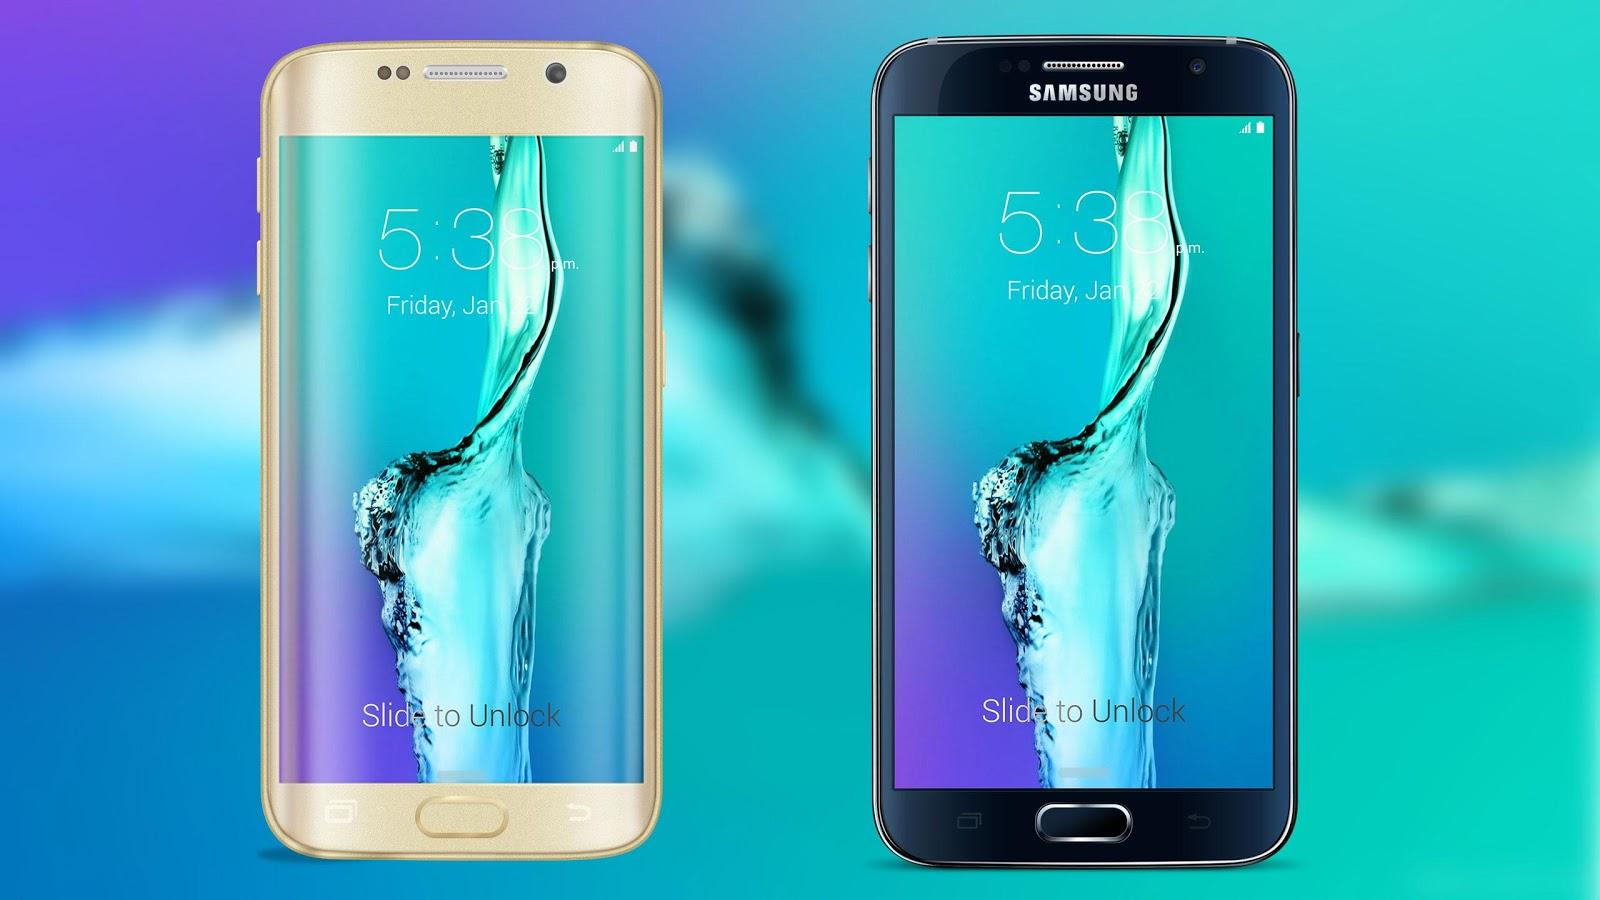 Galaxy Lock Screen Wallpaper Lock Screen Samsung S7 448088 Hd Wallpaper Backgrounds Download